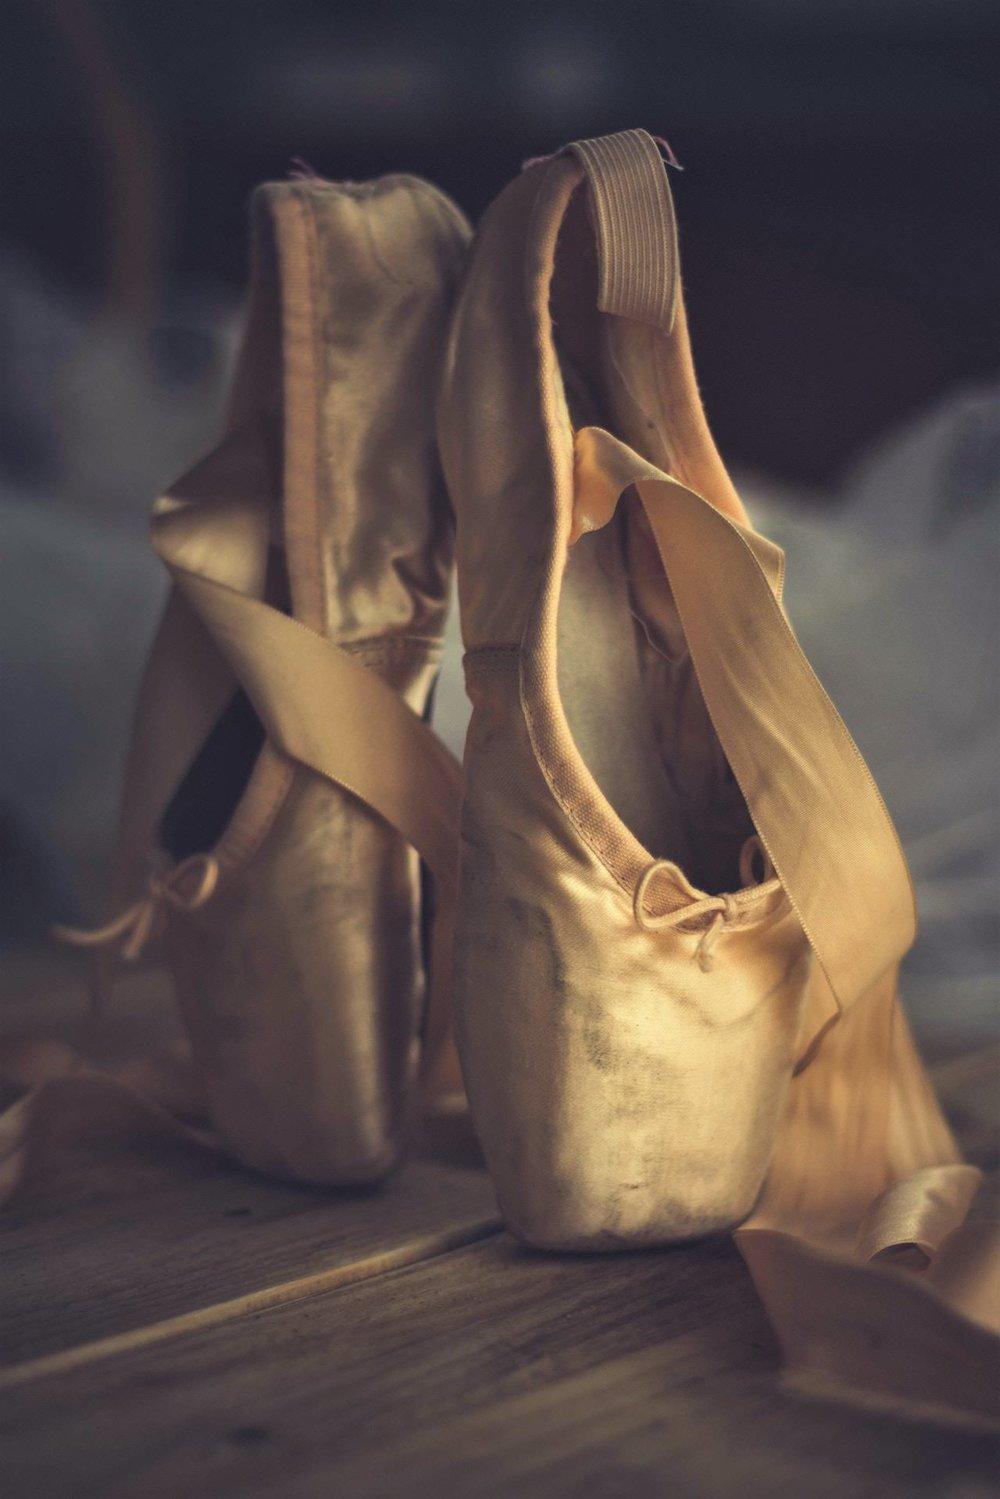 ballet slippers.jpeg